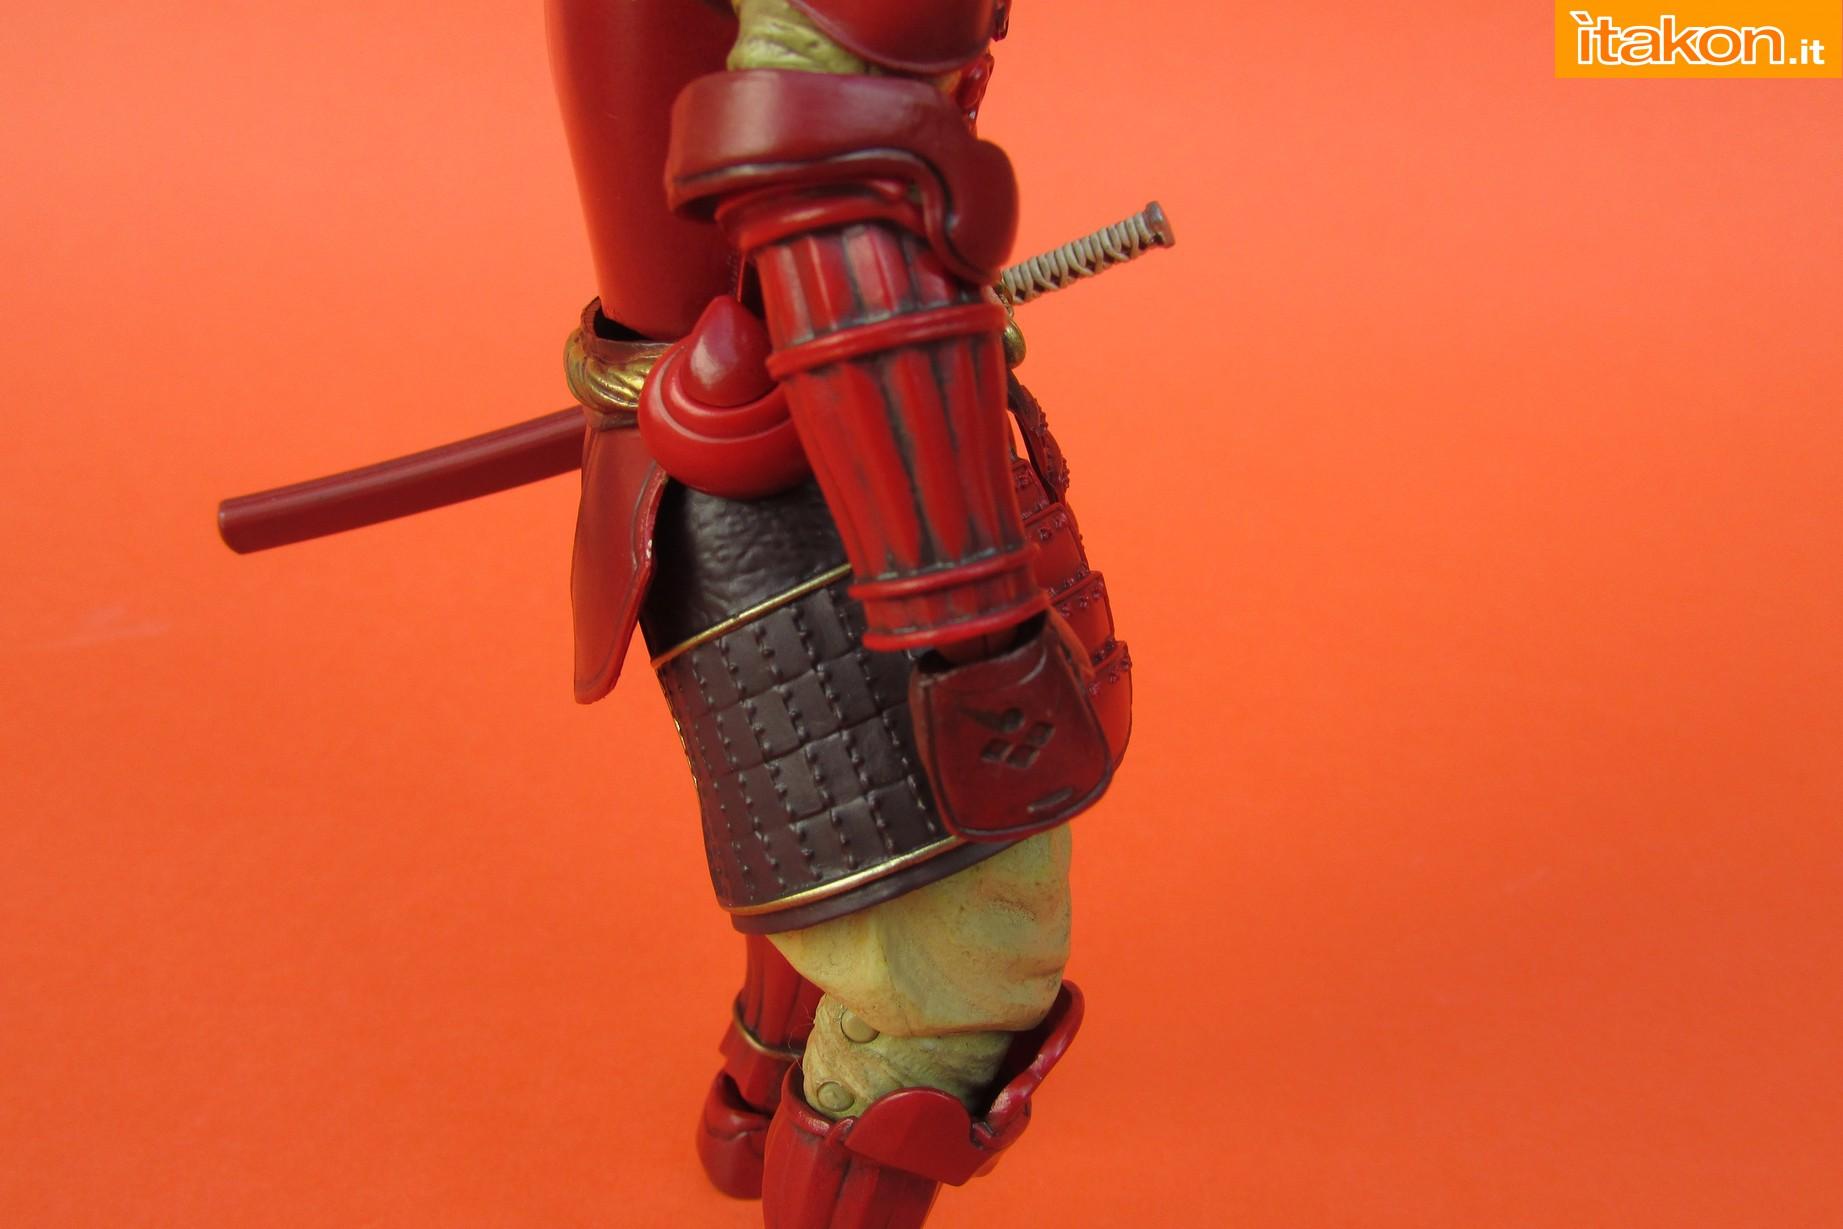 Link a Marvel Comics Koutetsu Samurai Iron Man Mark 3 Meishou MANGA REALIZATION review Bandai Itakon.it26